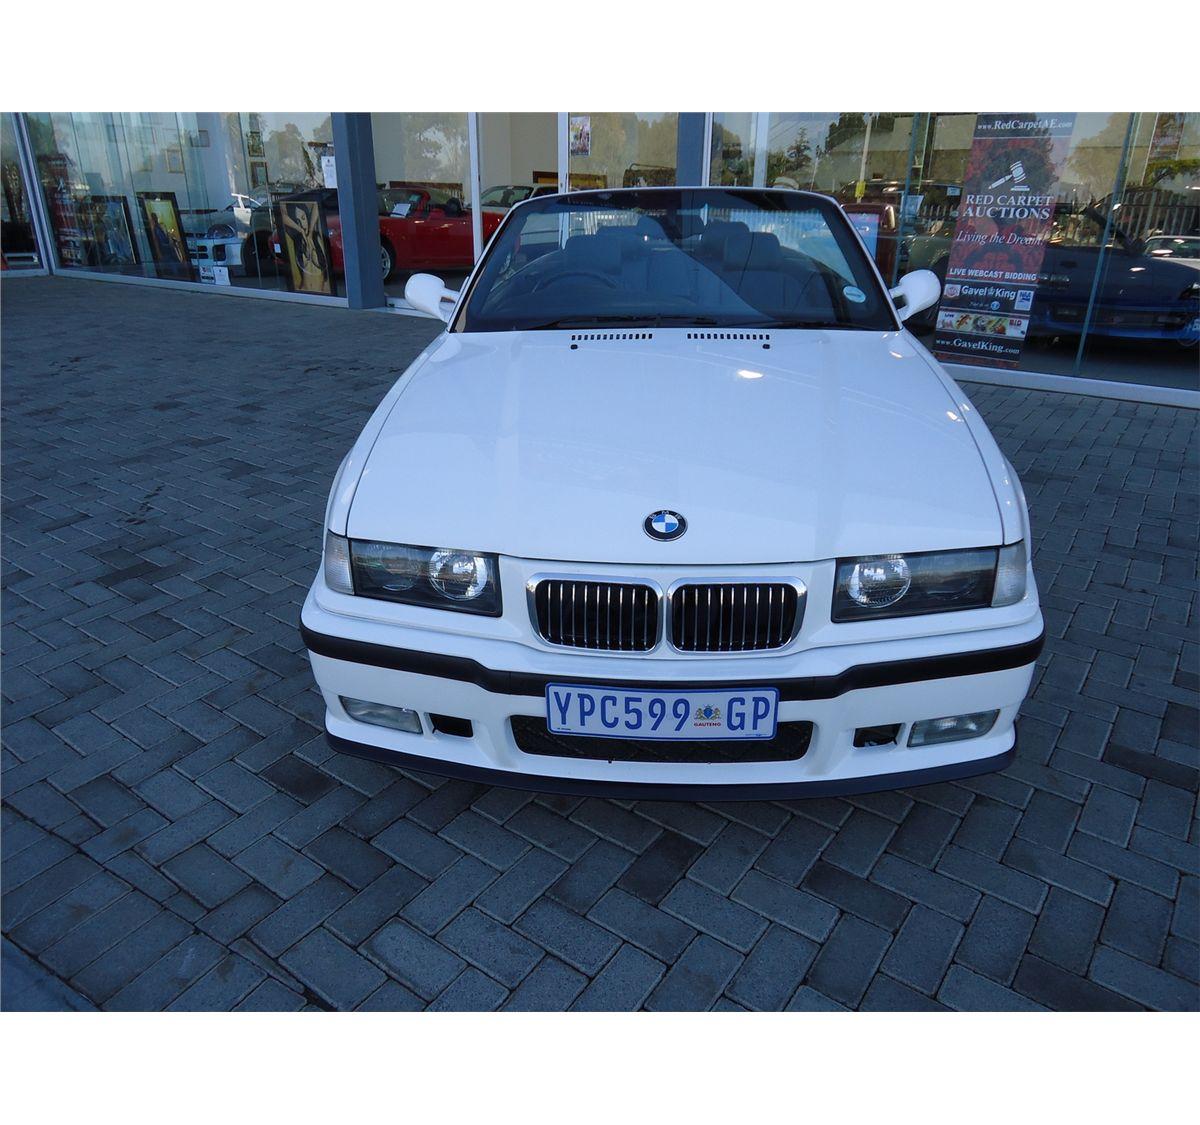 BMW 328I Convertible >> Bmw 328i Convertible 95 M3 Kit 18 Wheels Dropped